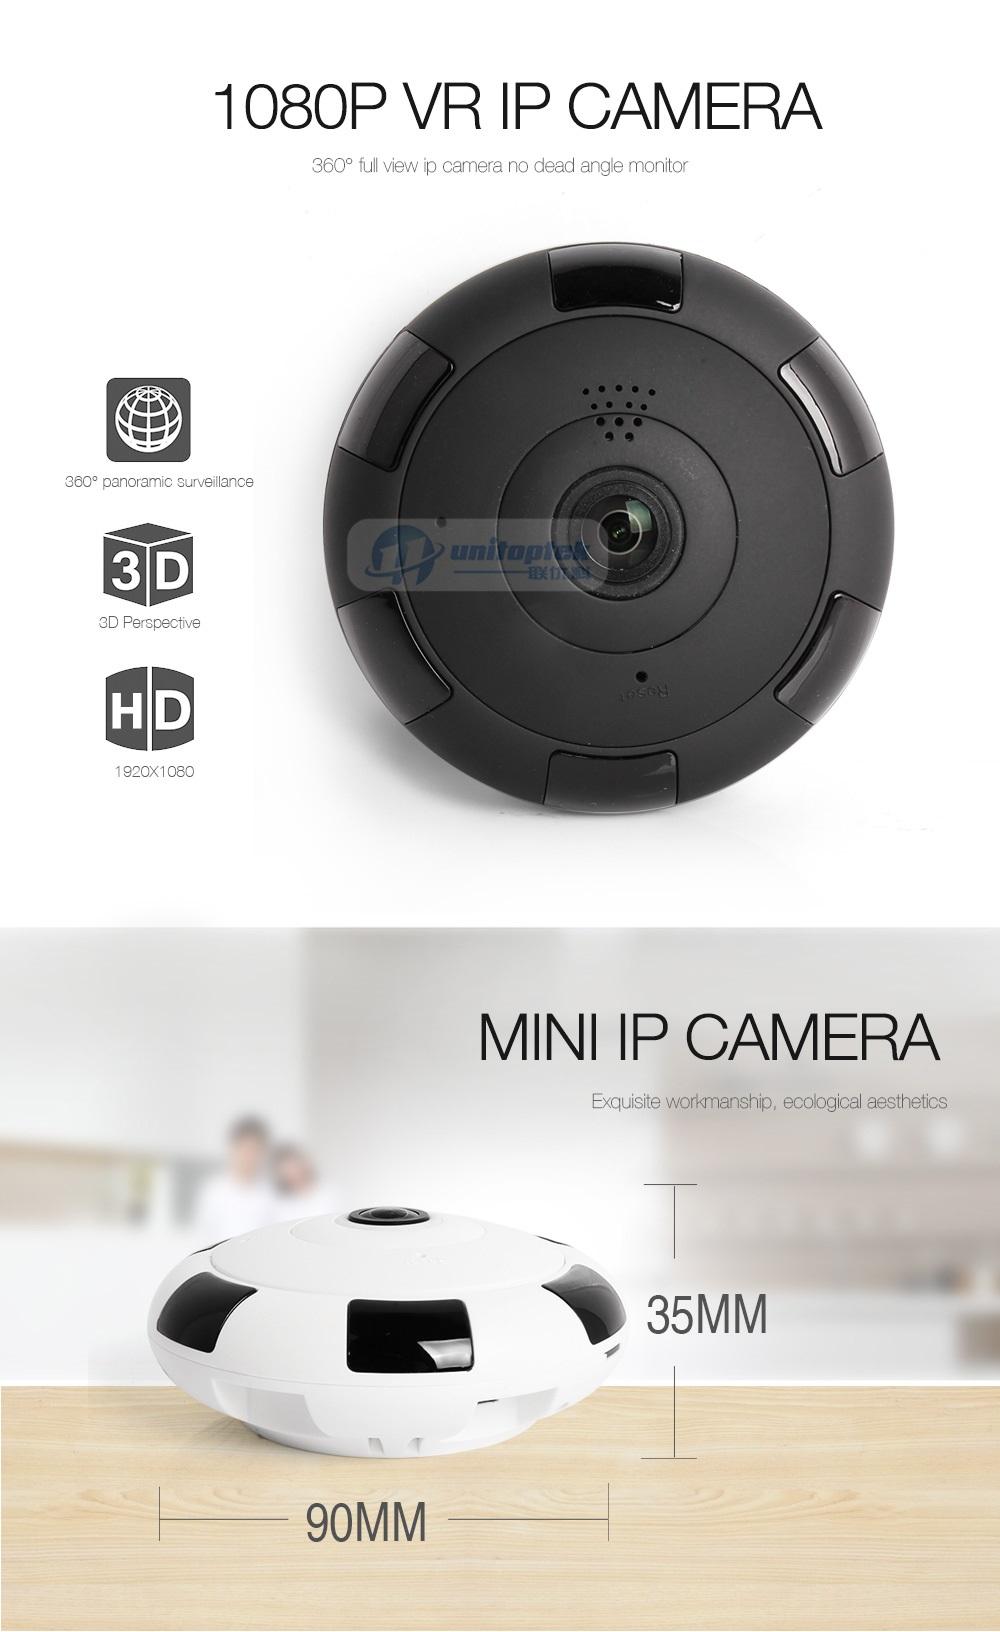 P301-VR Camera- ip camera wi-fi_08